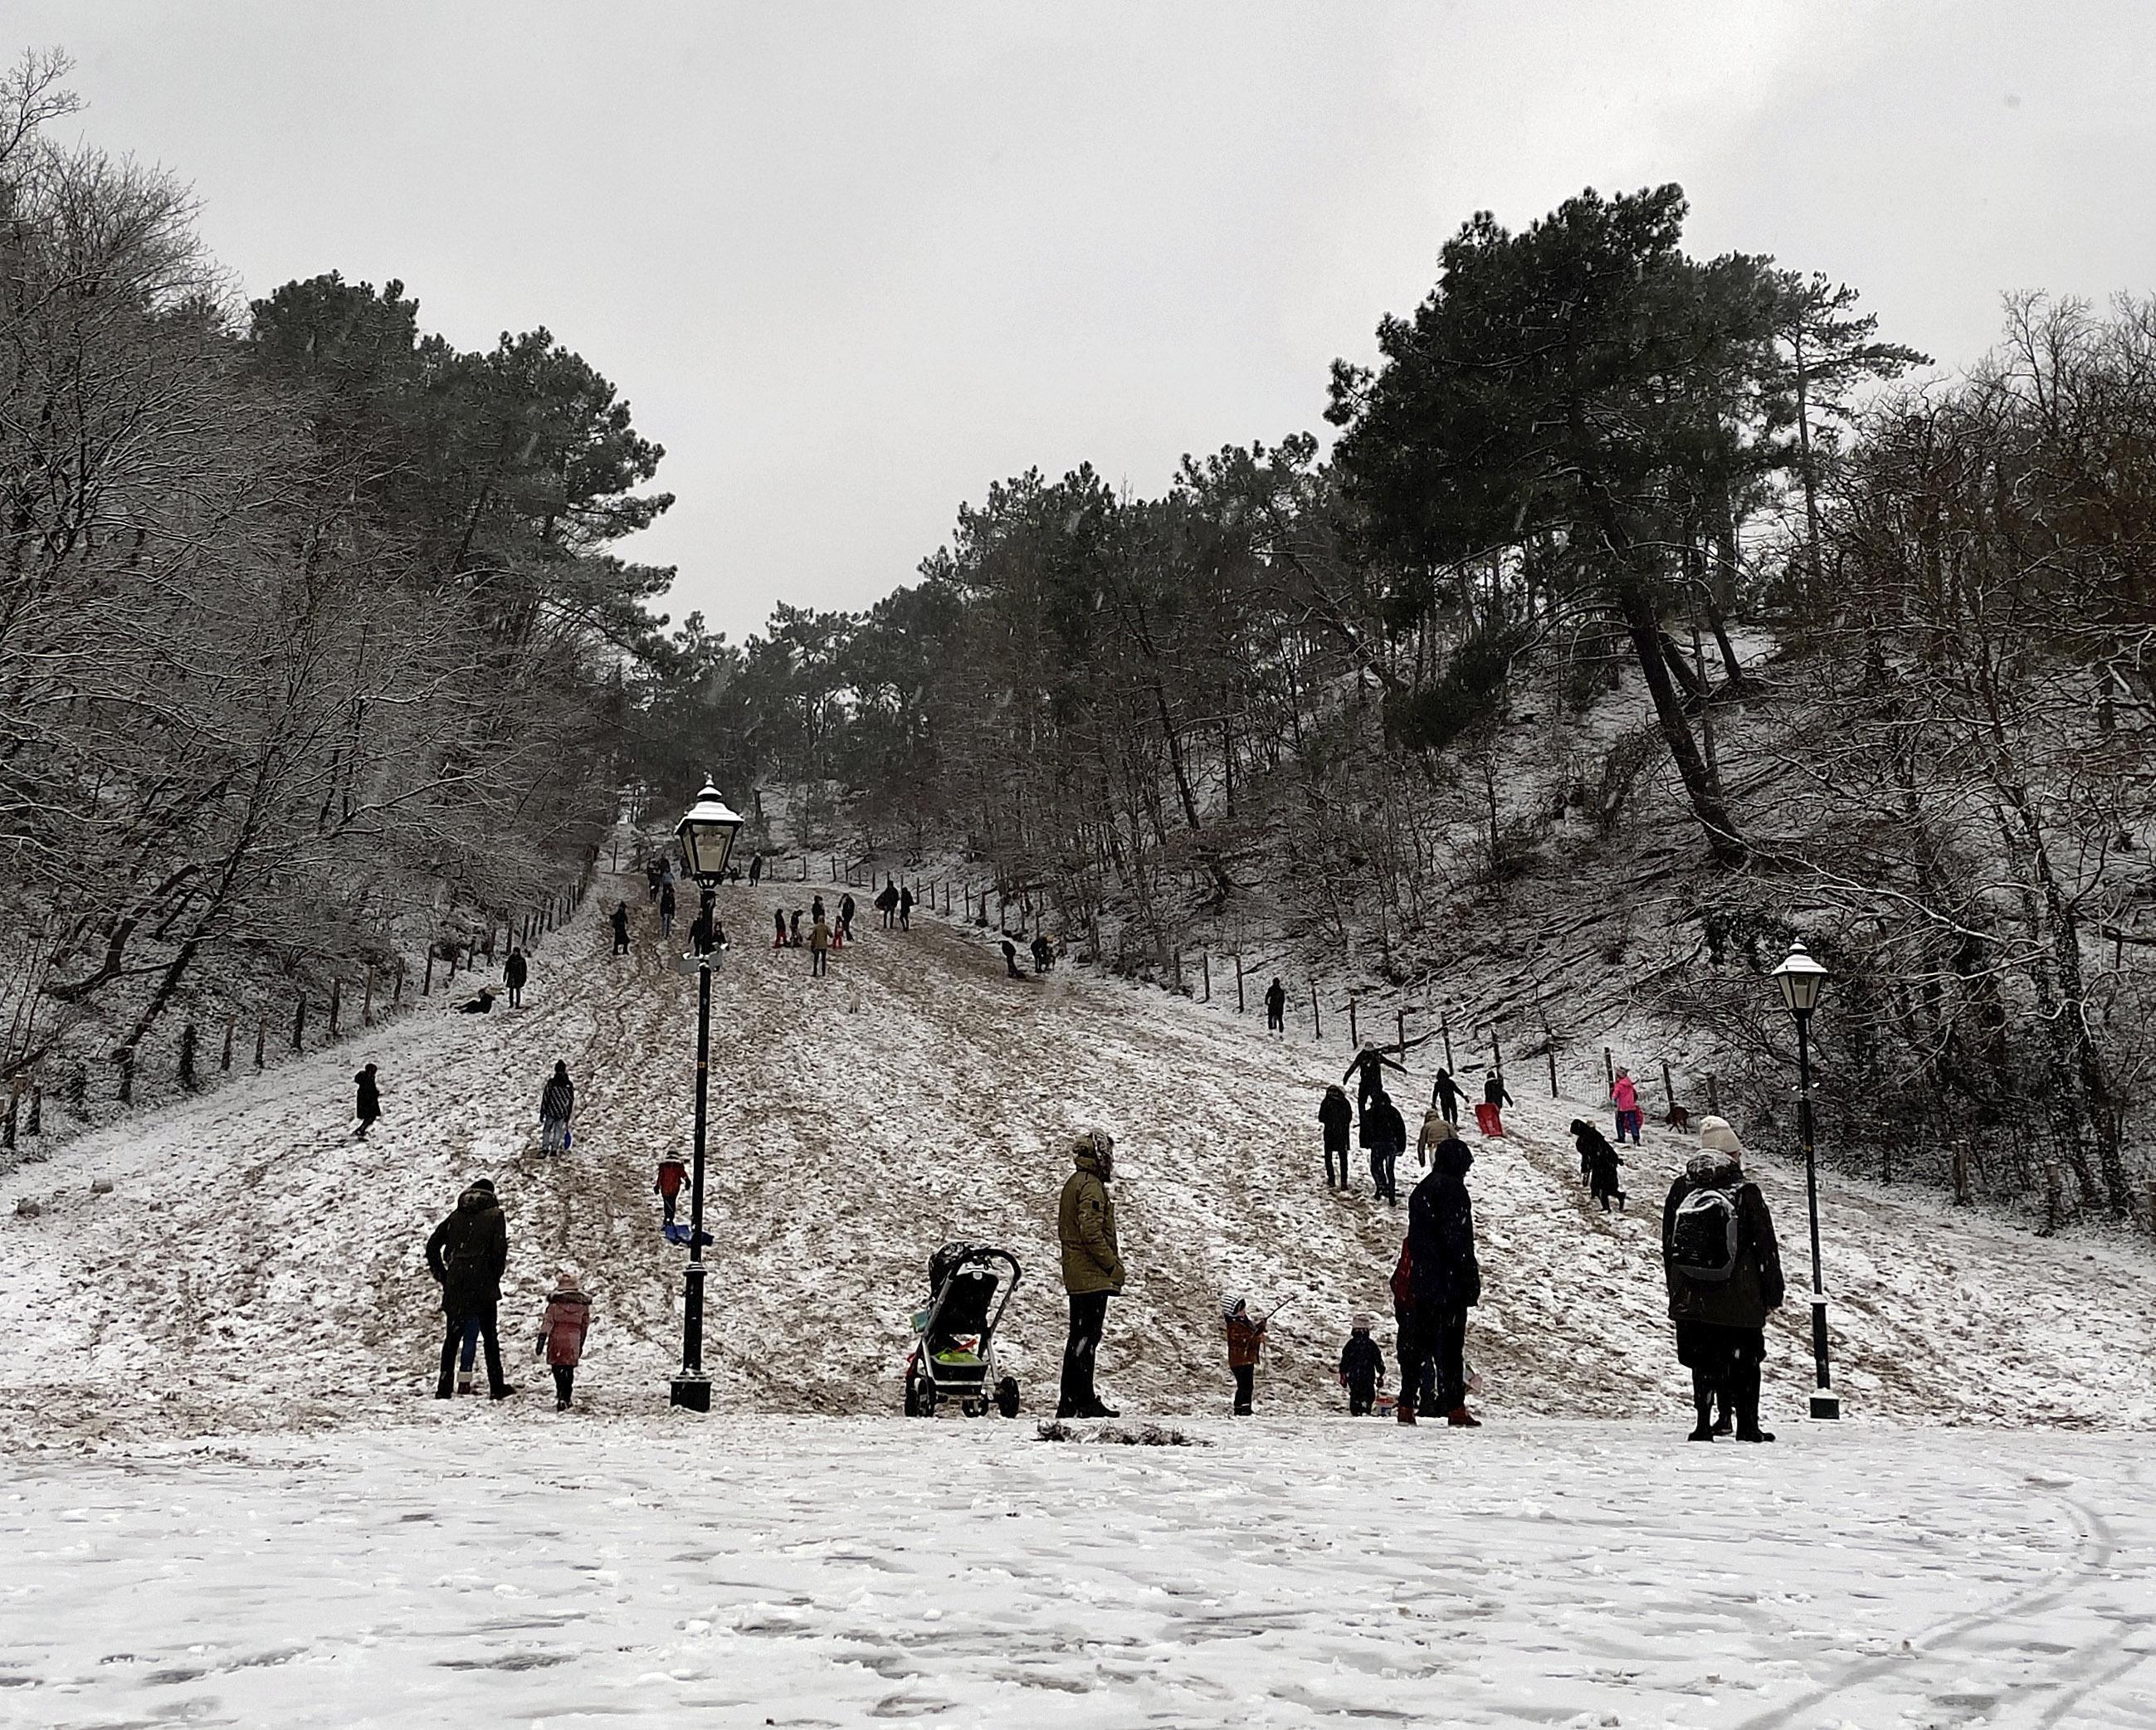 Genieten geblazen in sneeuw en winterse kou in en rondom Alkmaar